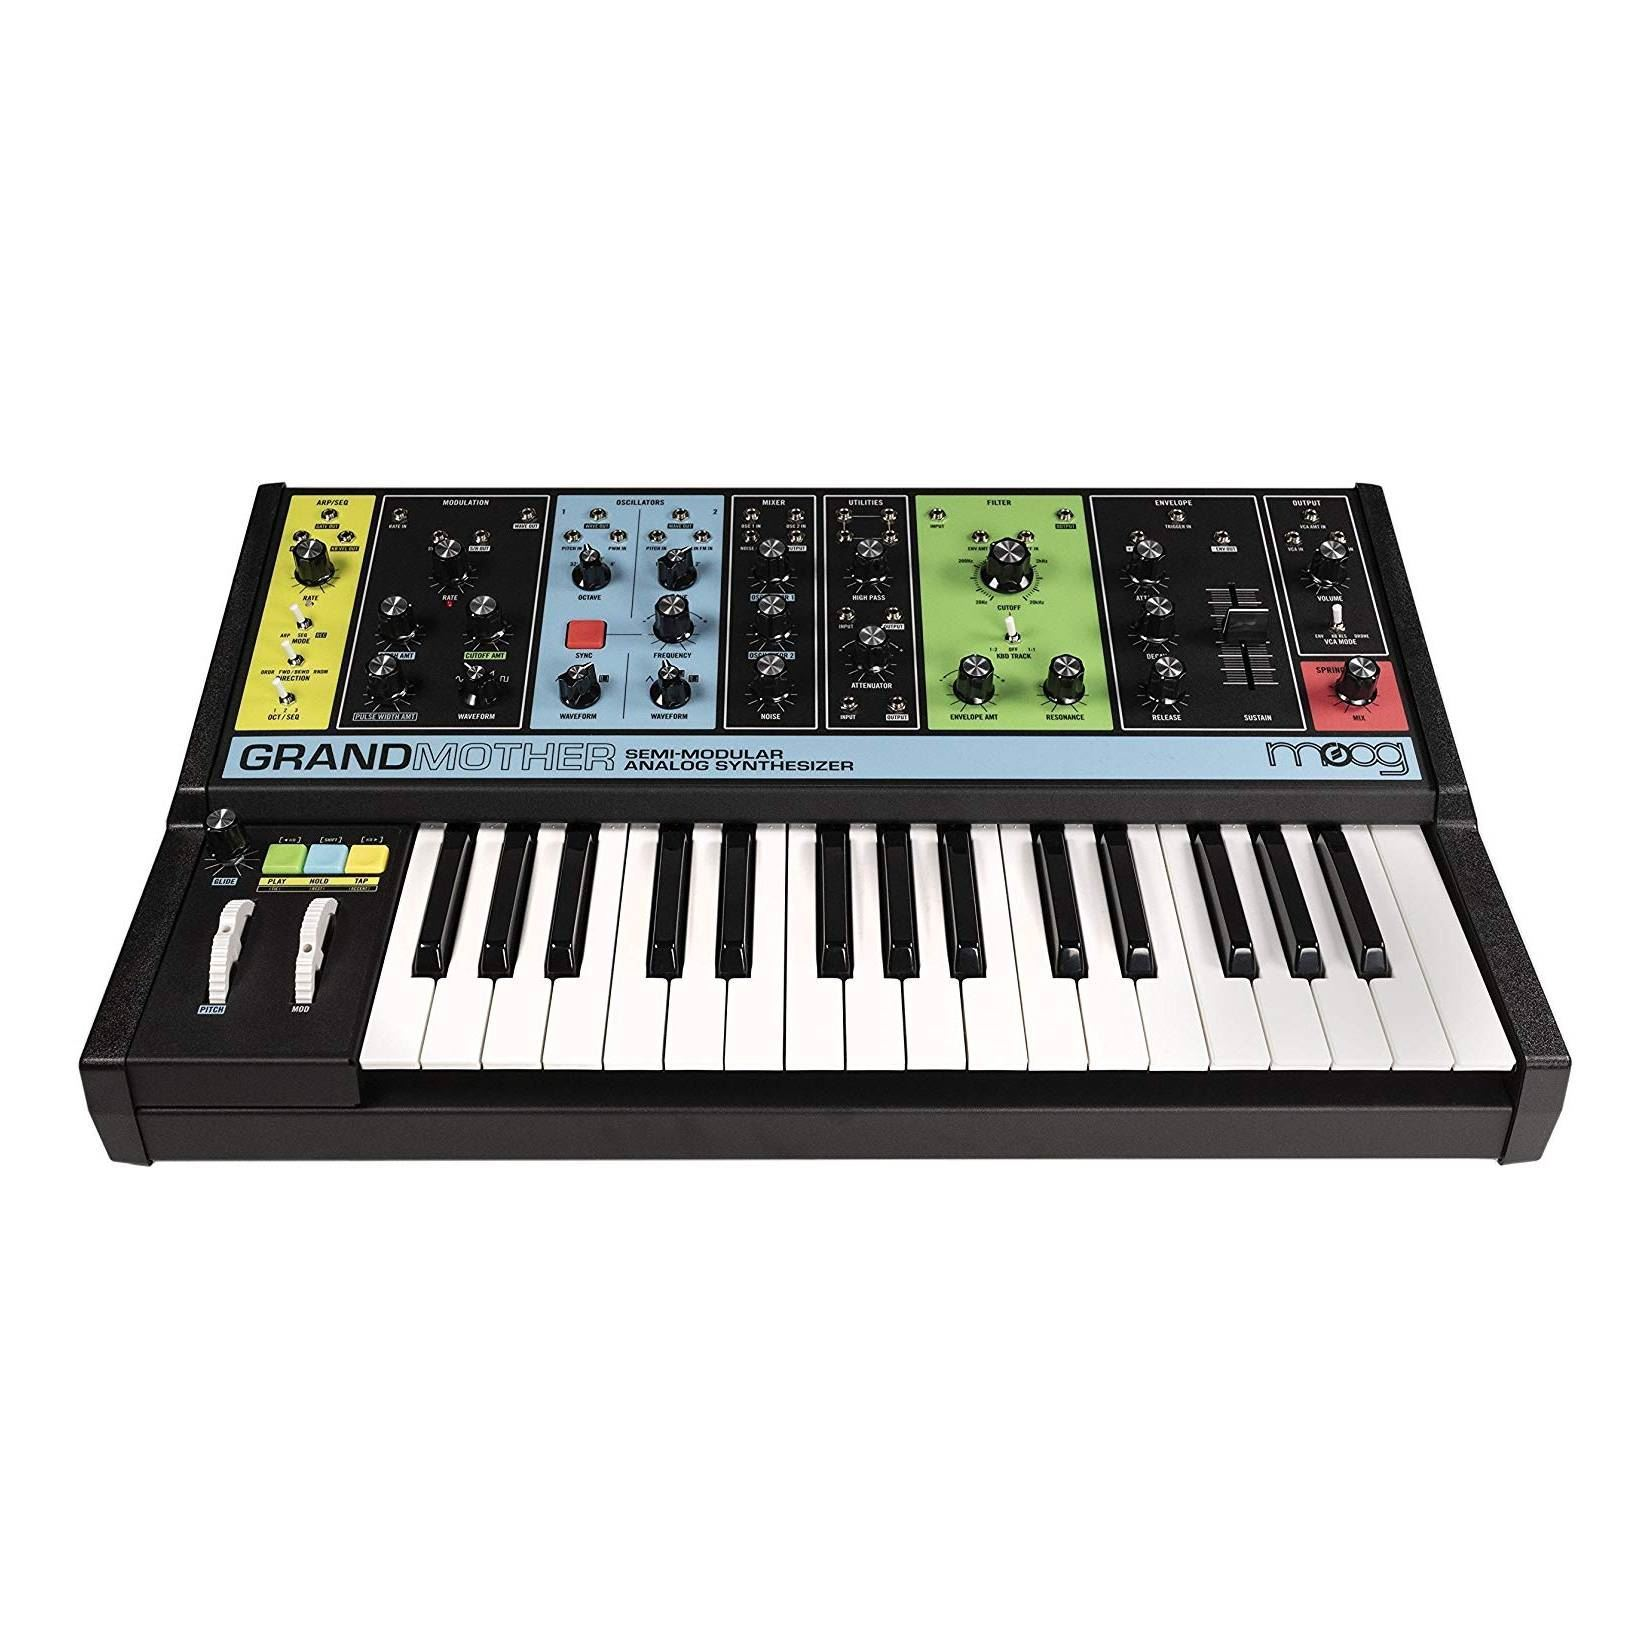 Moog Grandmother Semi-Modular Analogue Synthesizer - Front